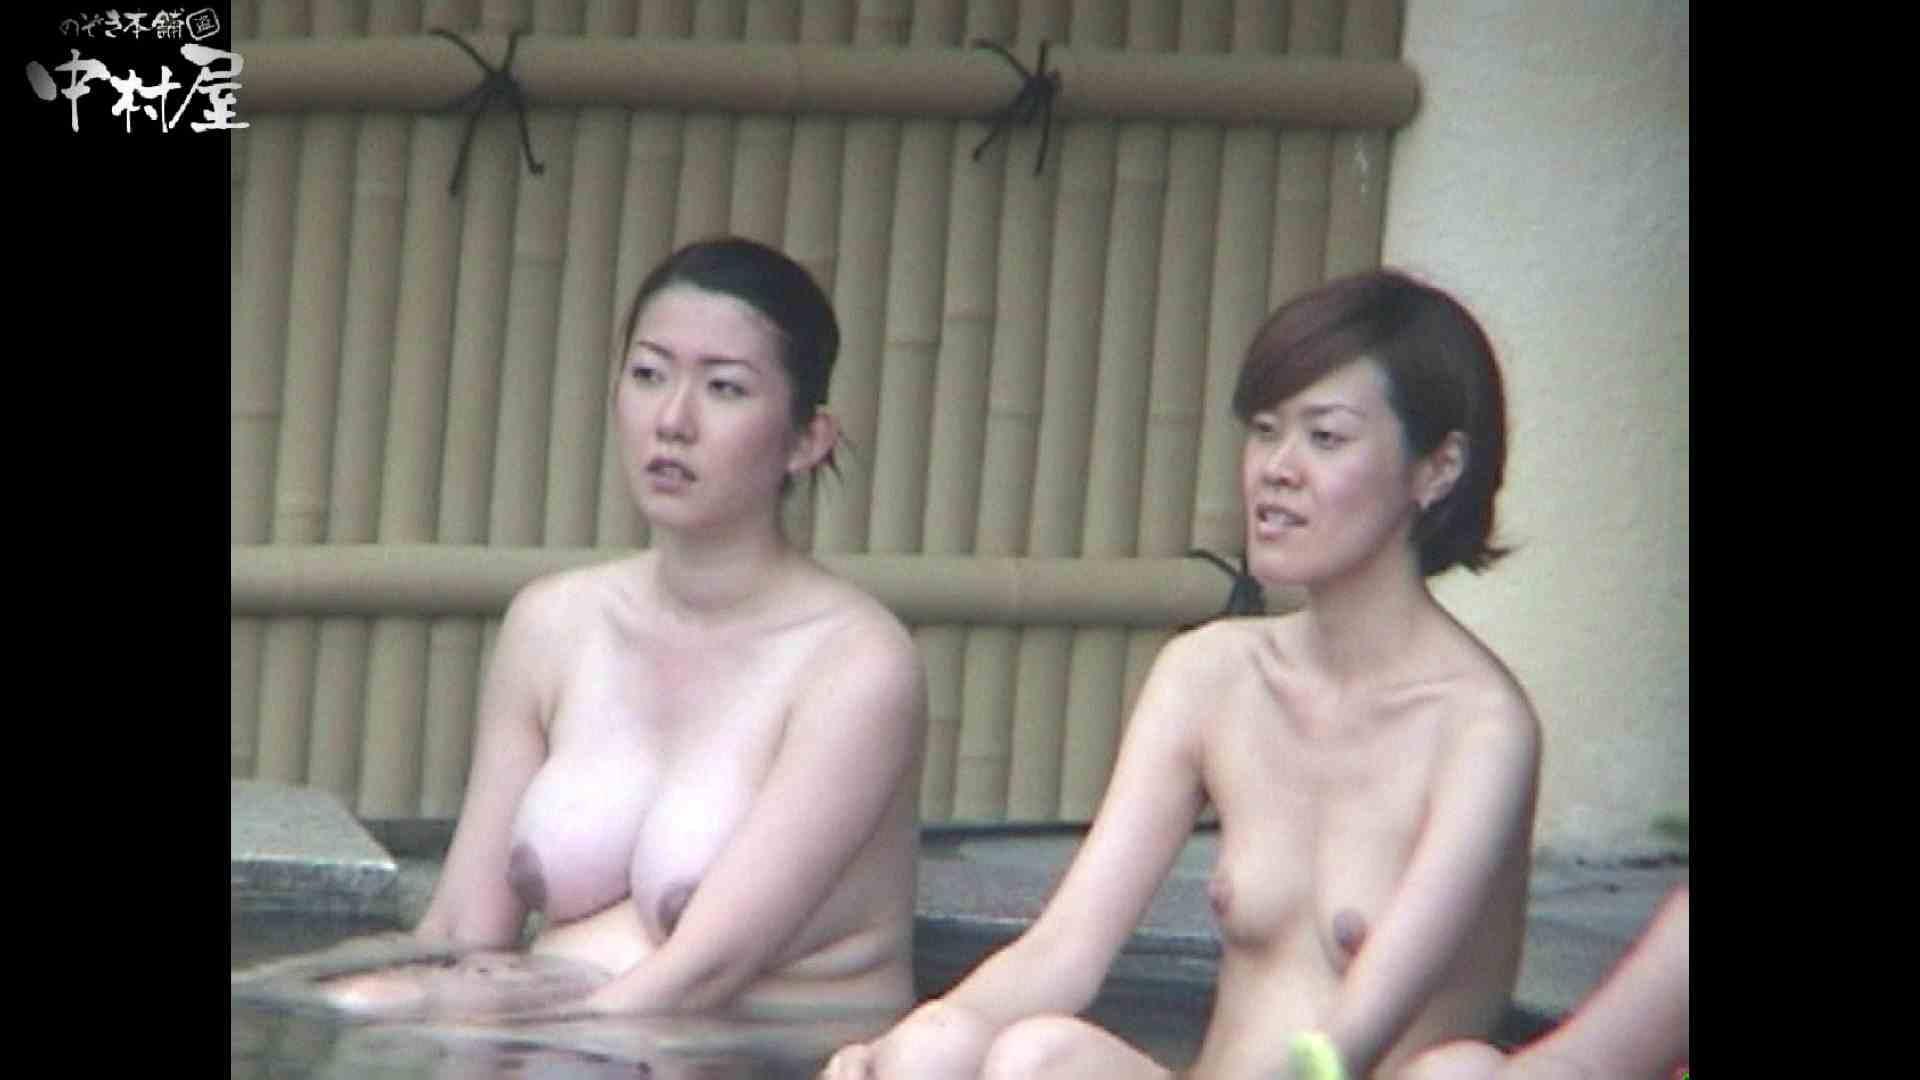 Aquaな露天風呂Vol.961 OL女体  65連発 18